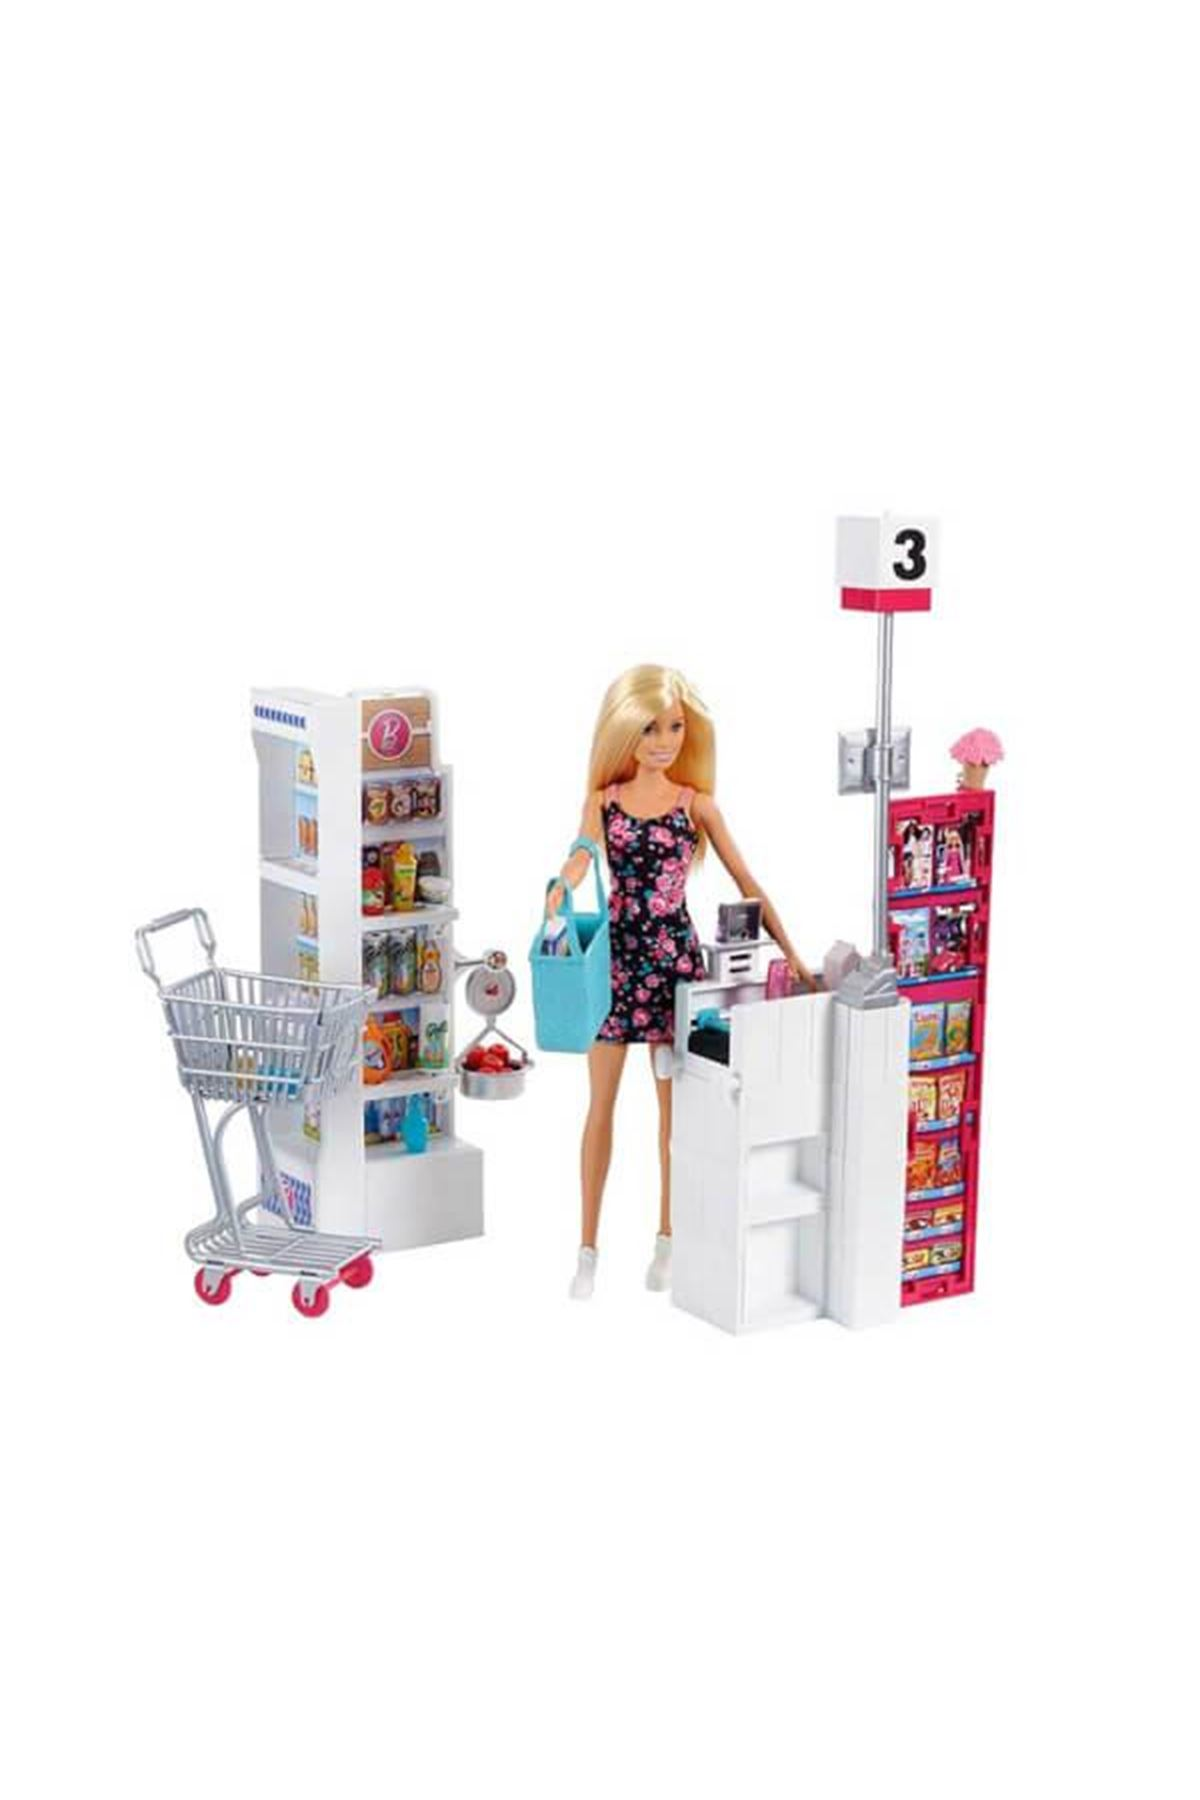 Barbie Süper Markette Oyun Seti FRP01